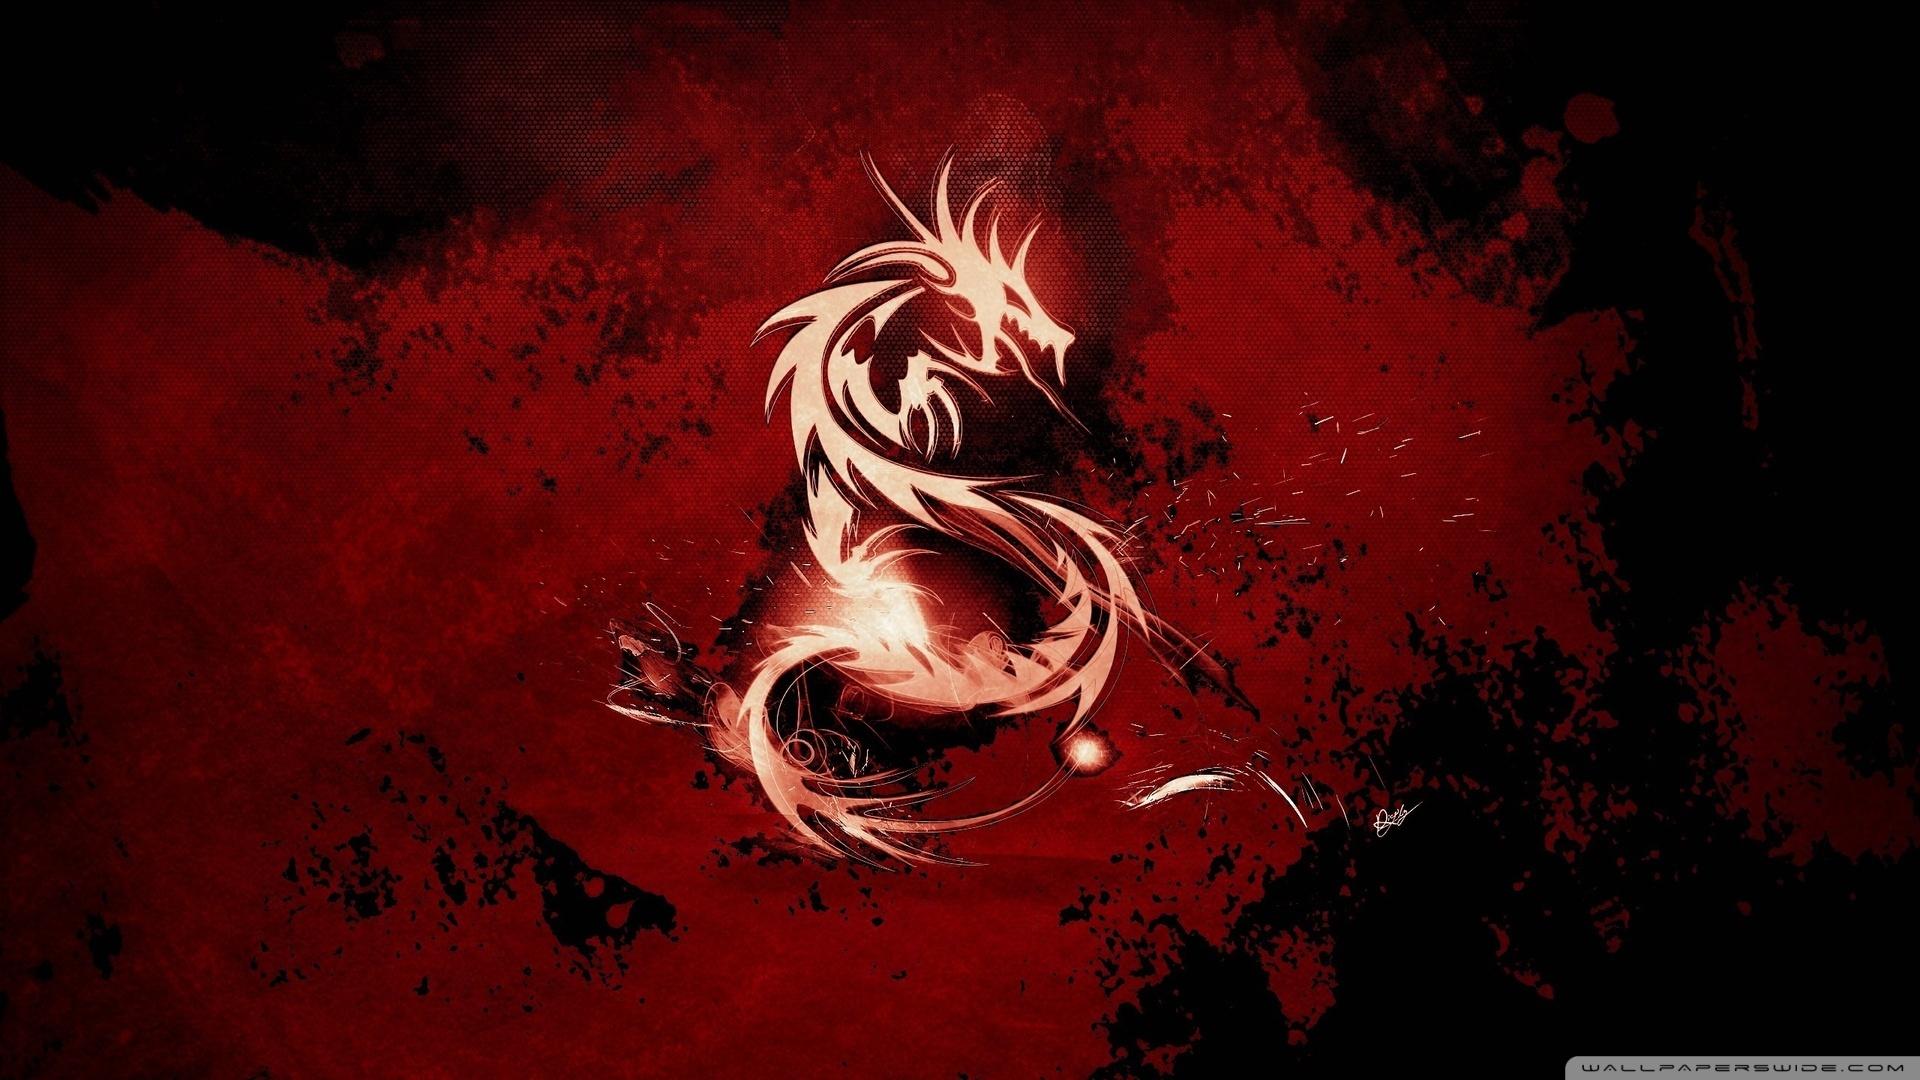 Blood Red Dragon Wallpaper 1920x1080